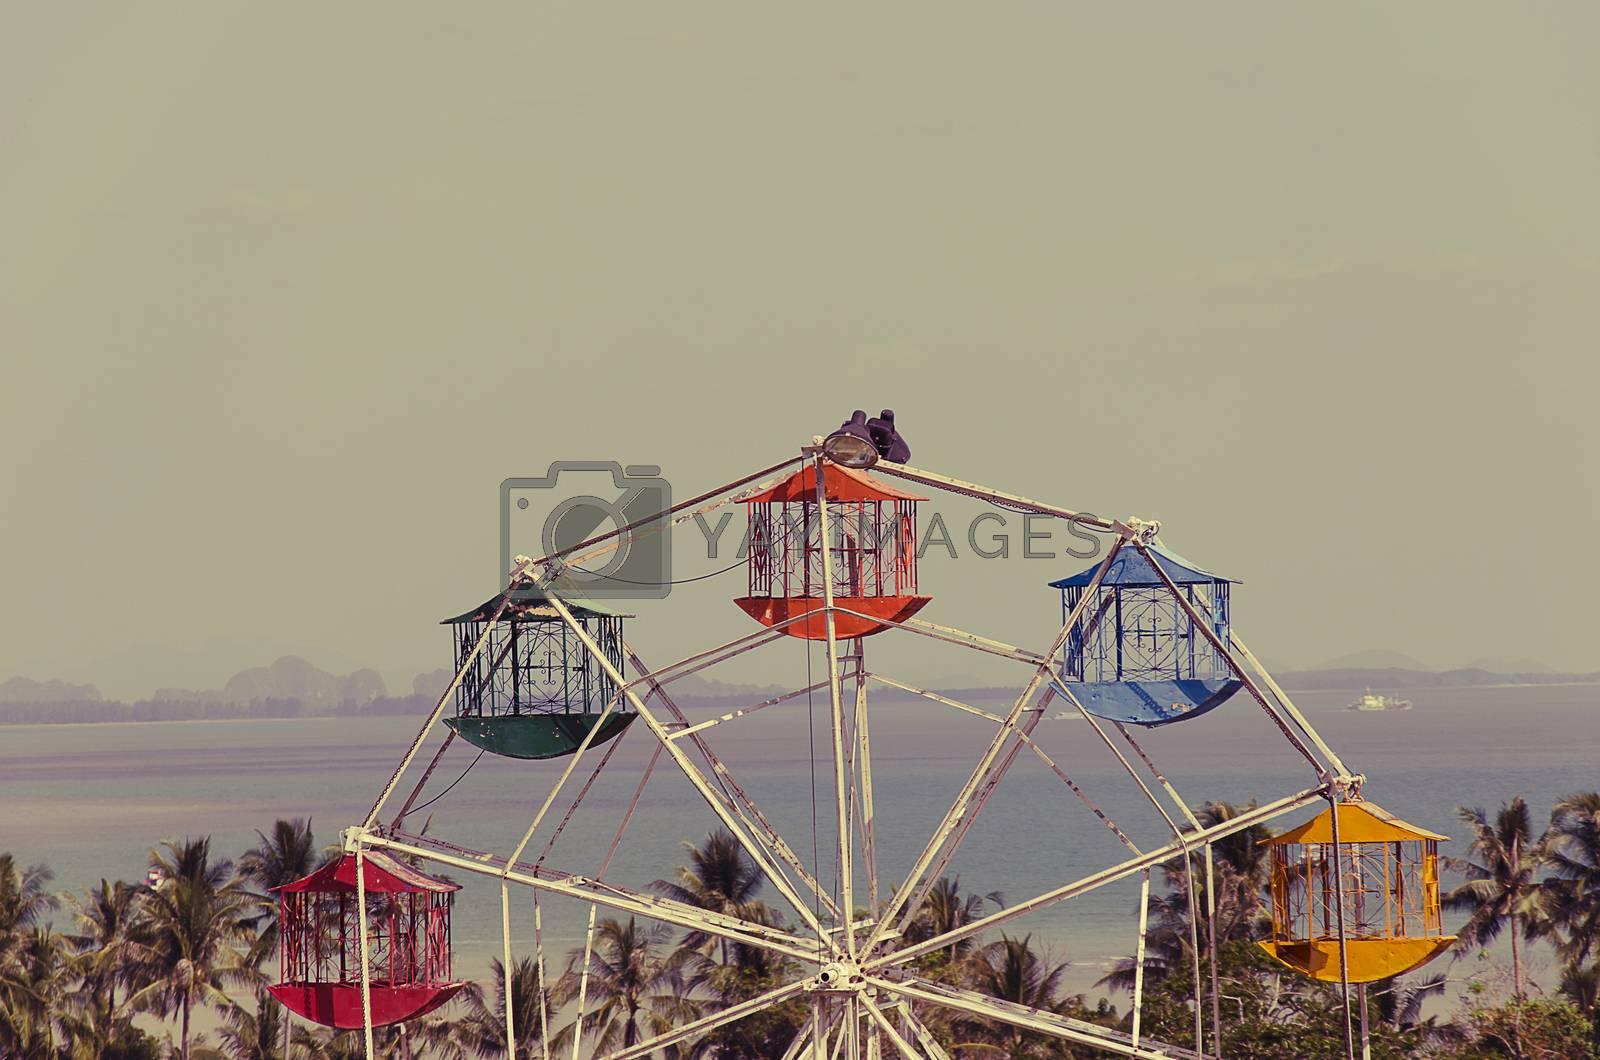 Ferris Wheel Over Blue Sky - vintage filter effect